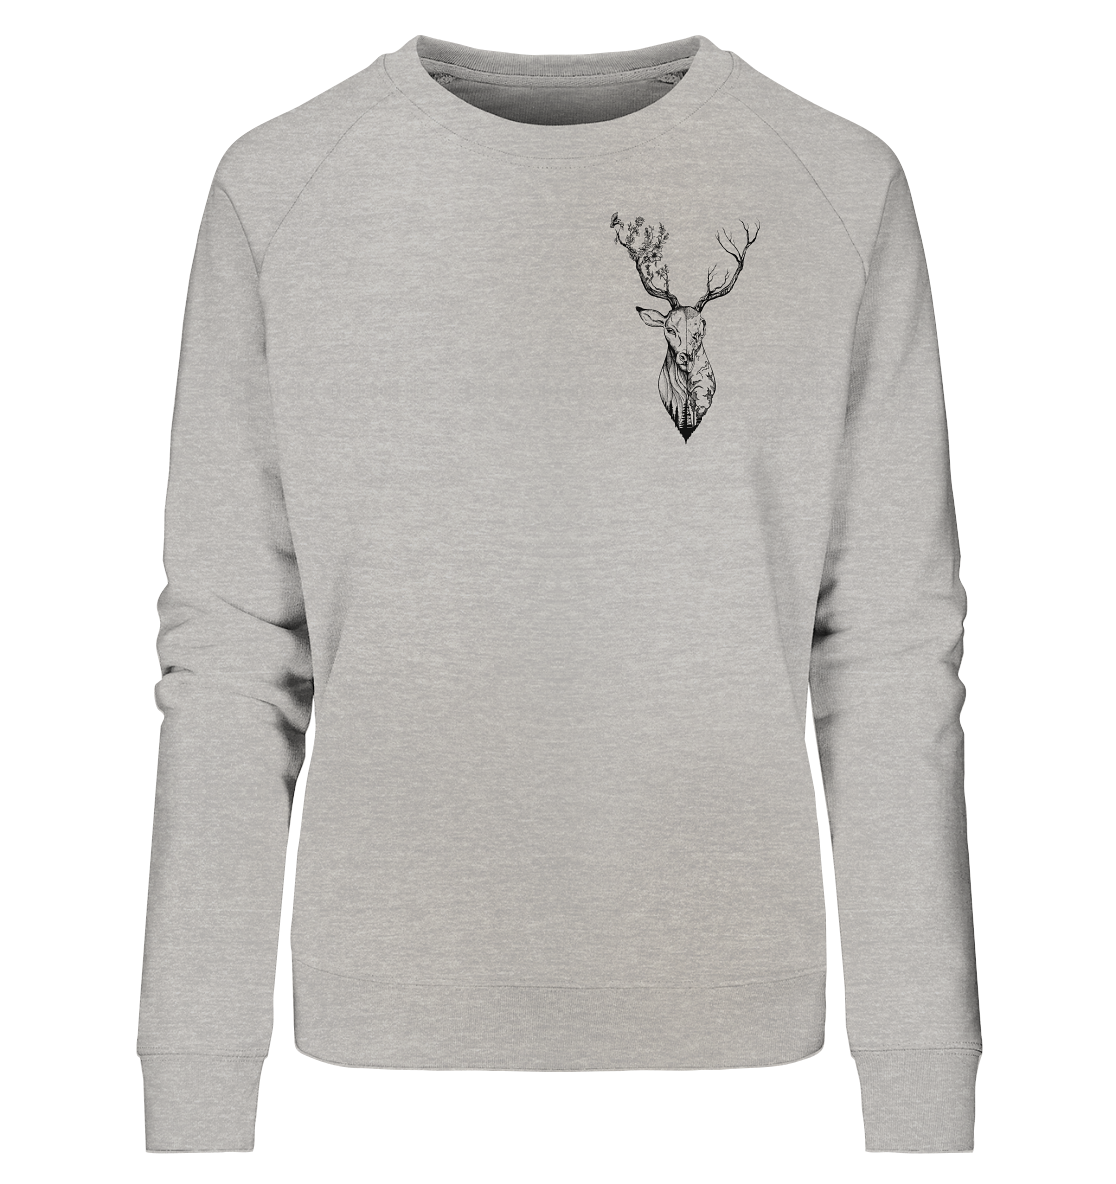 front-ladies-organic-sweatshirt-c2c1c0-1116x-7.png